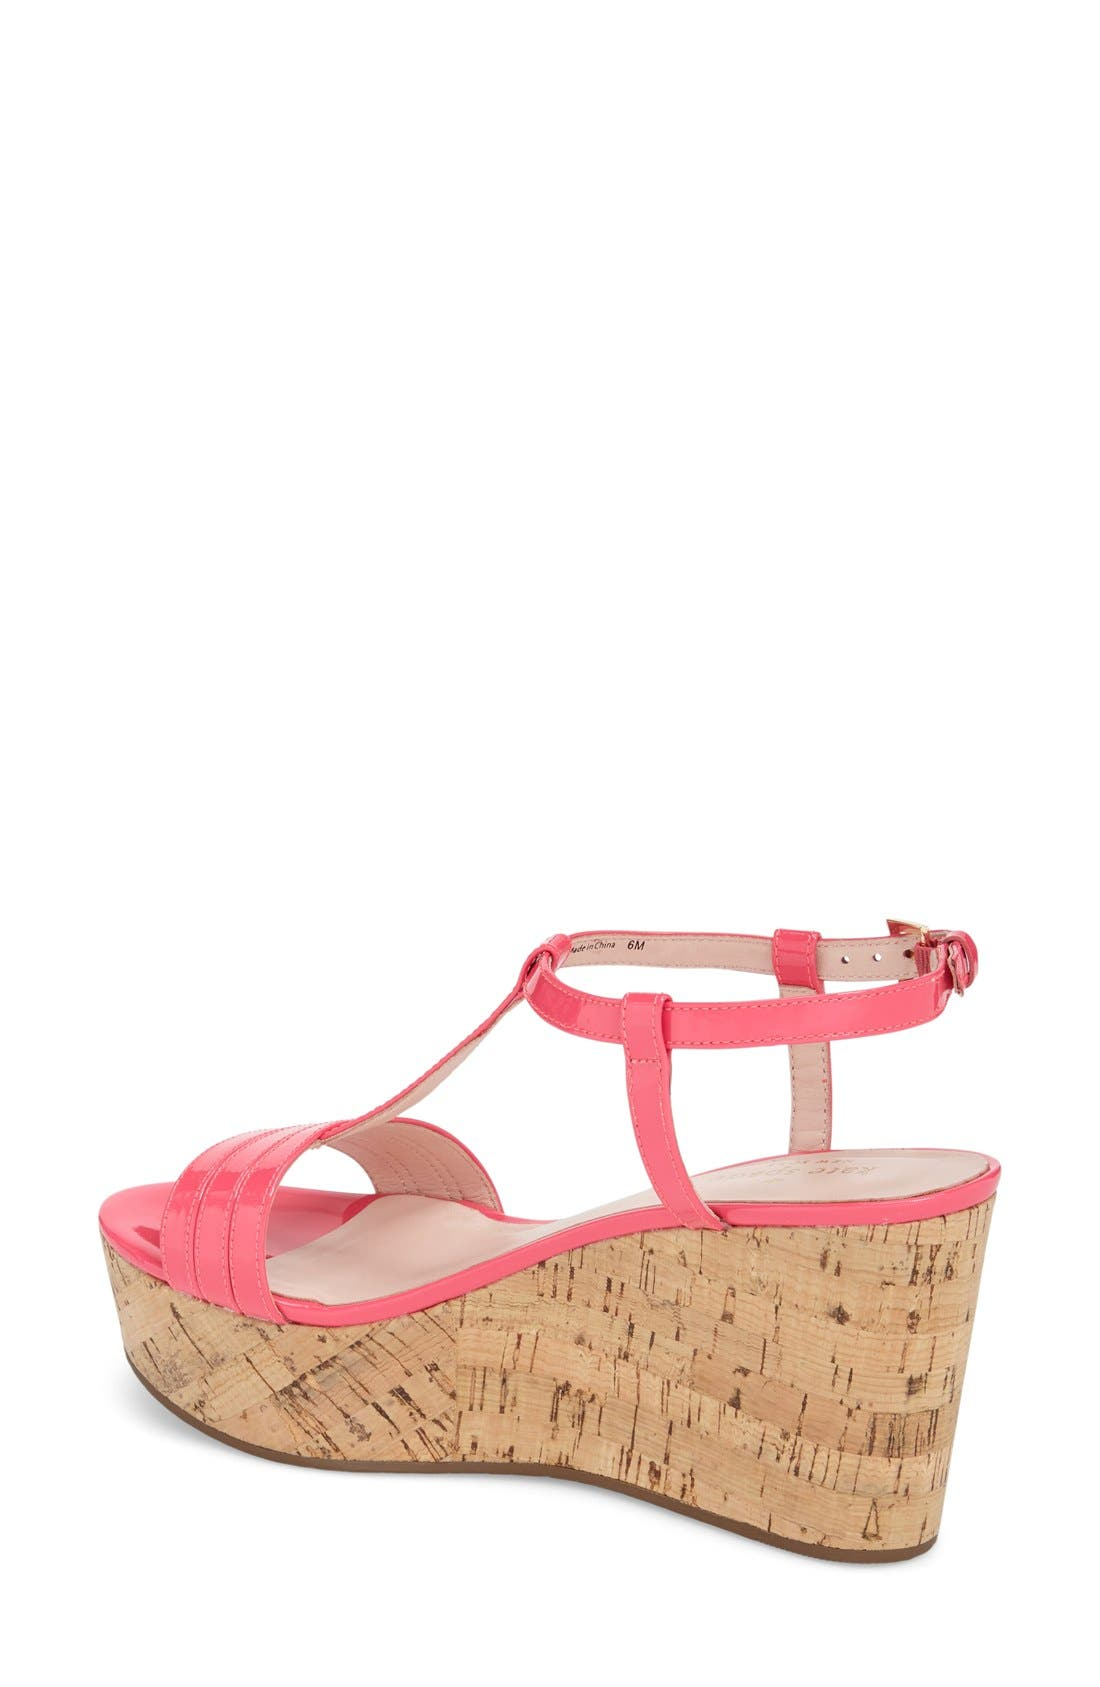 Alternate Image 2  - kate spade new york 'tallin' wedge sandal (Women)